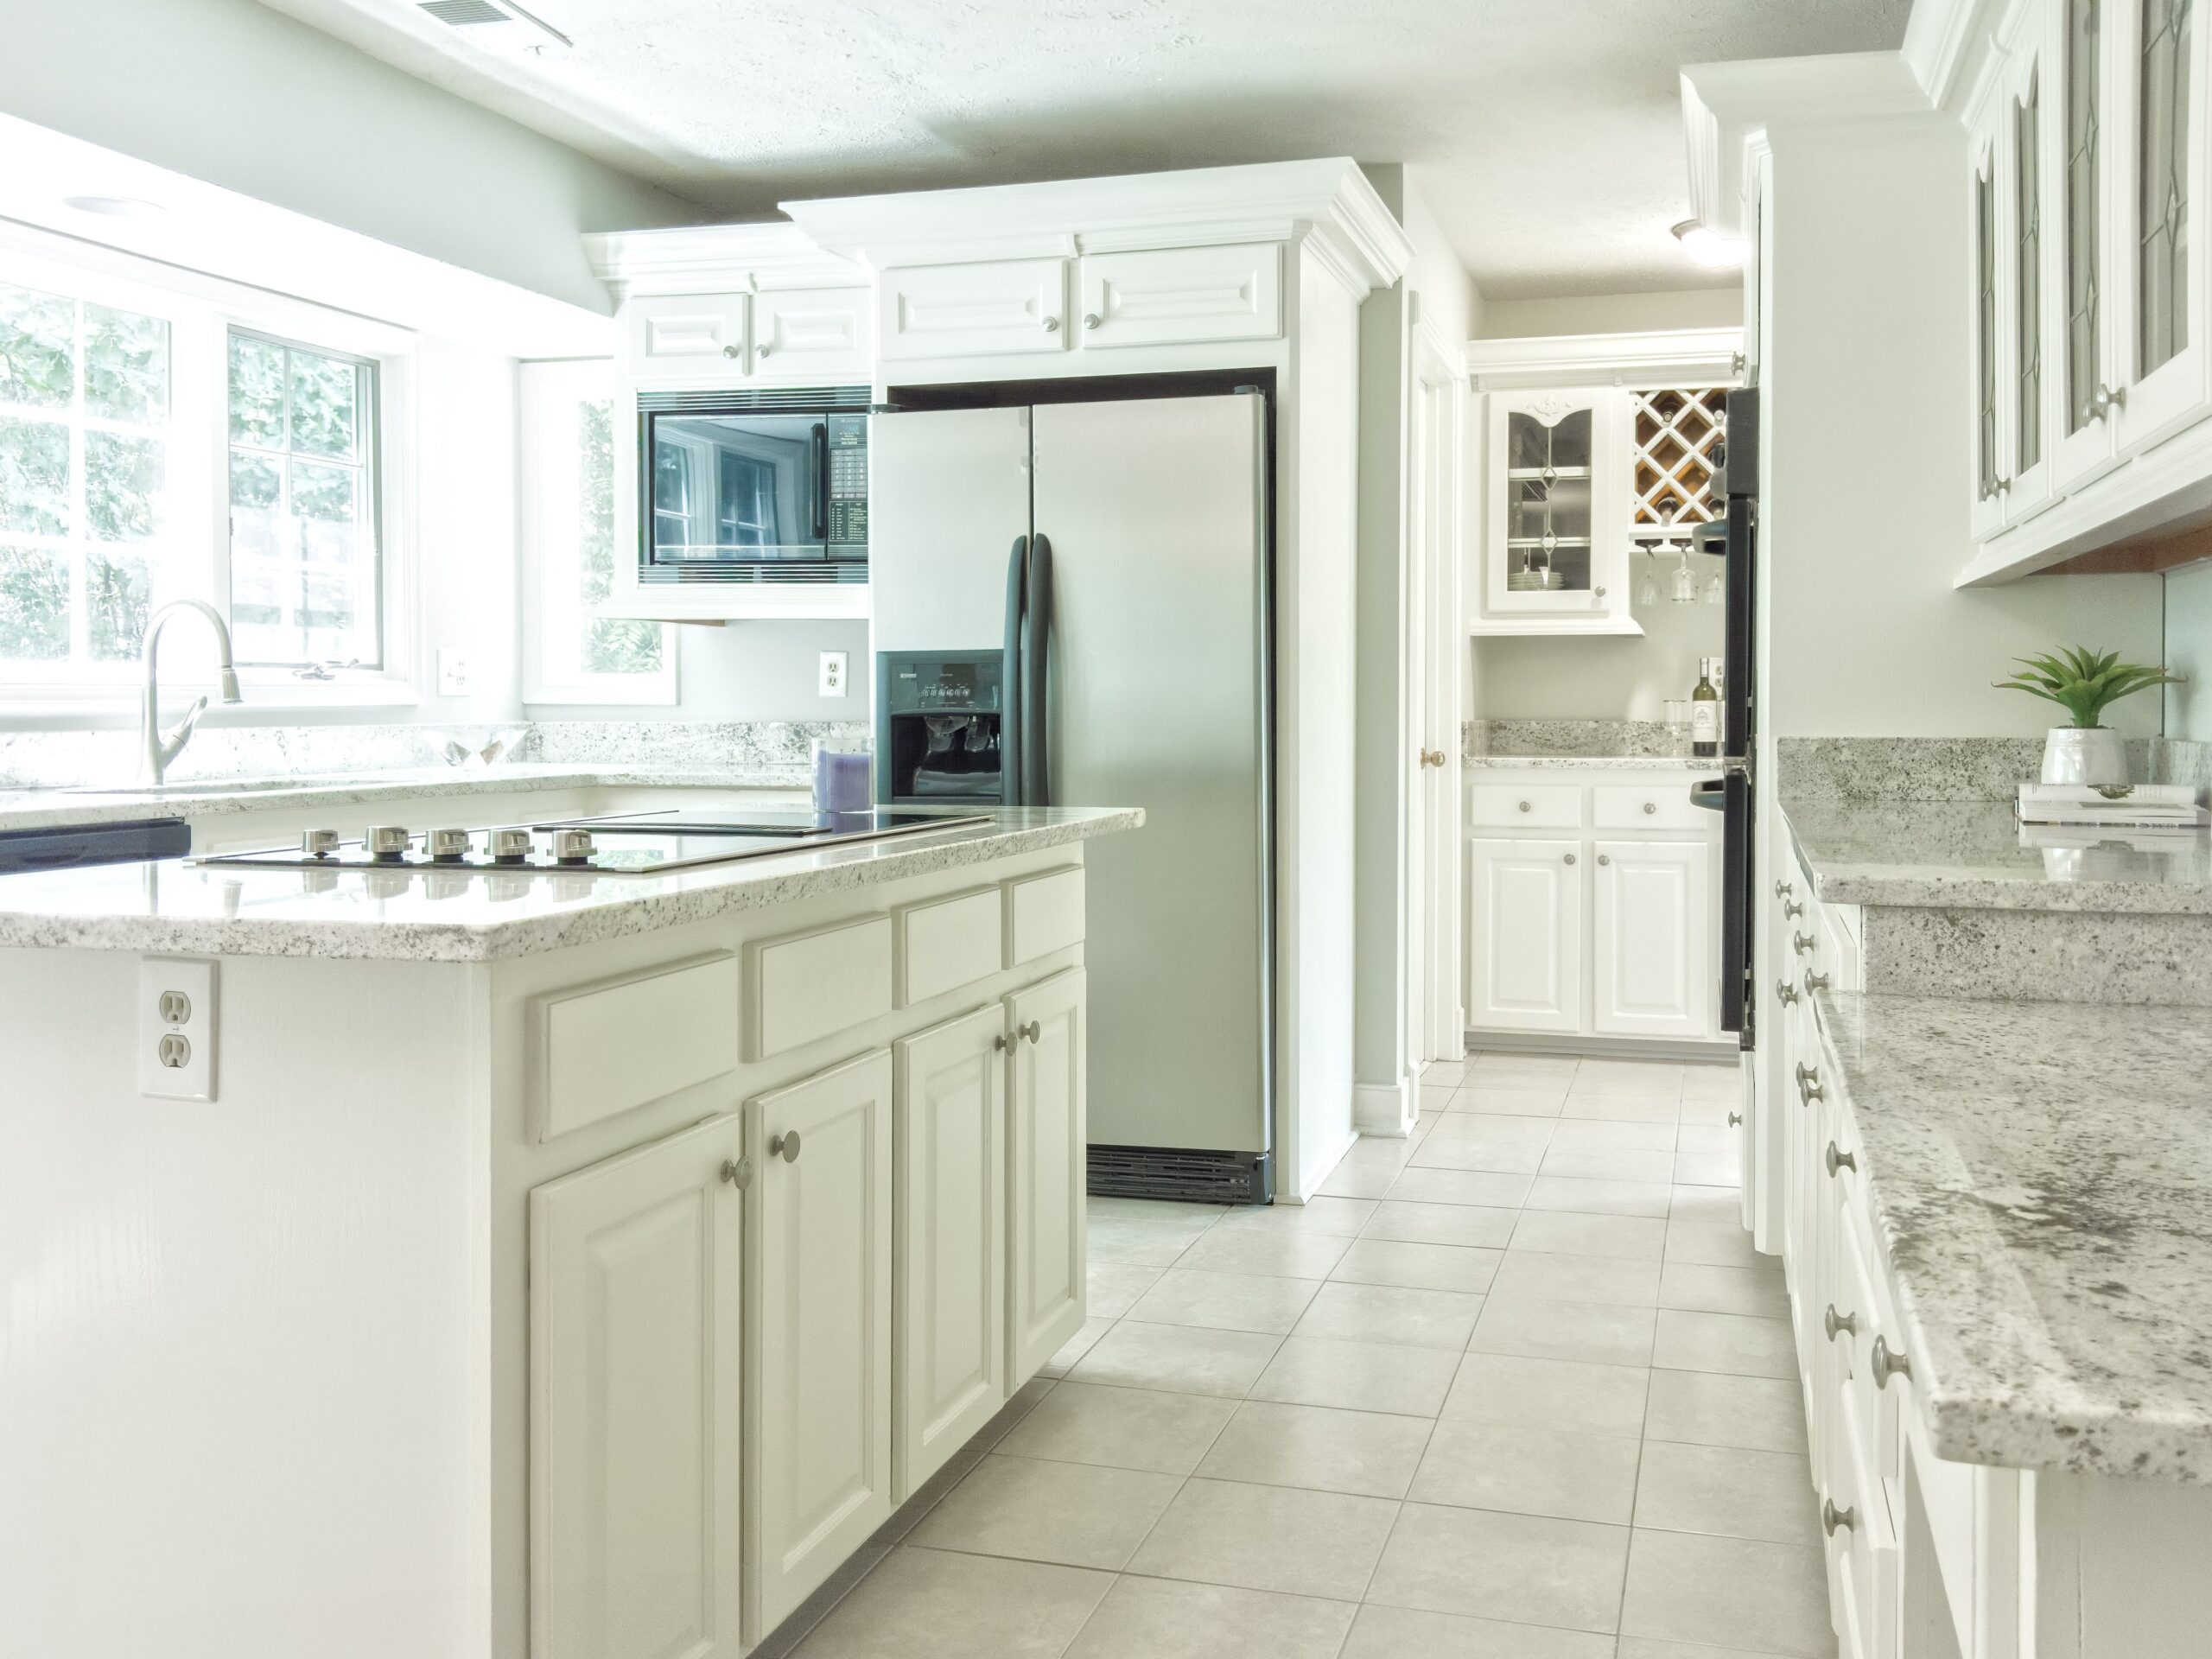 Kitchen Cabinets: The Basics